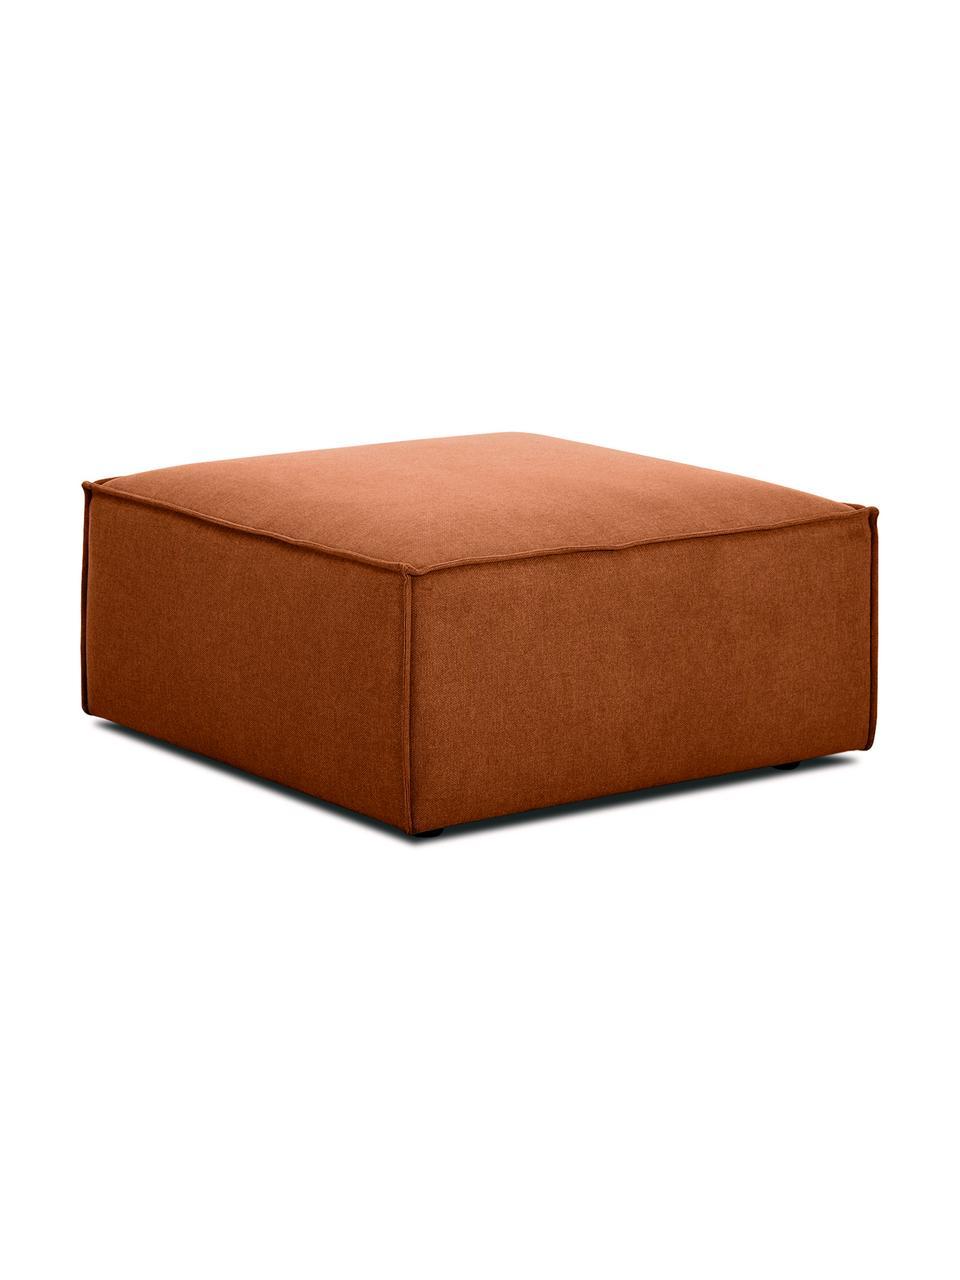 Sofa-Hocker Lennon in Terrakotta, Bezug: Polyester Der hochwertige, Gestell: Massives Kiefernholz, Spe, Füße: Kunststoff Die Füße befin, Webstoff Terrakotta, 88 x 43 cm